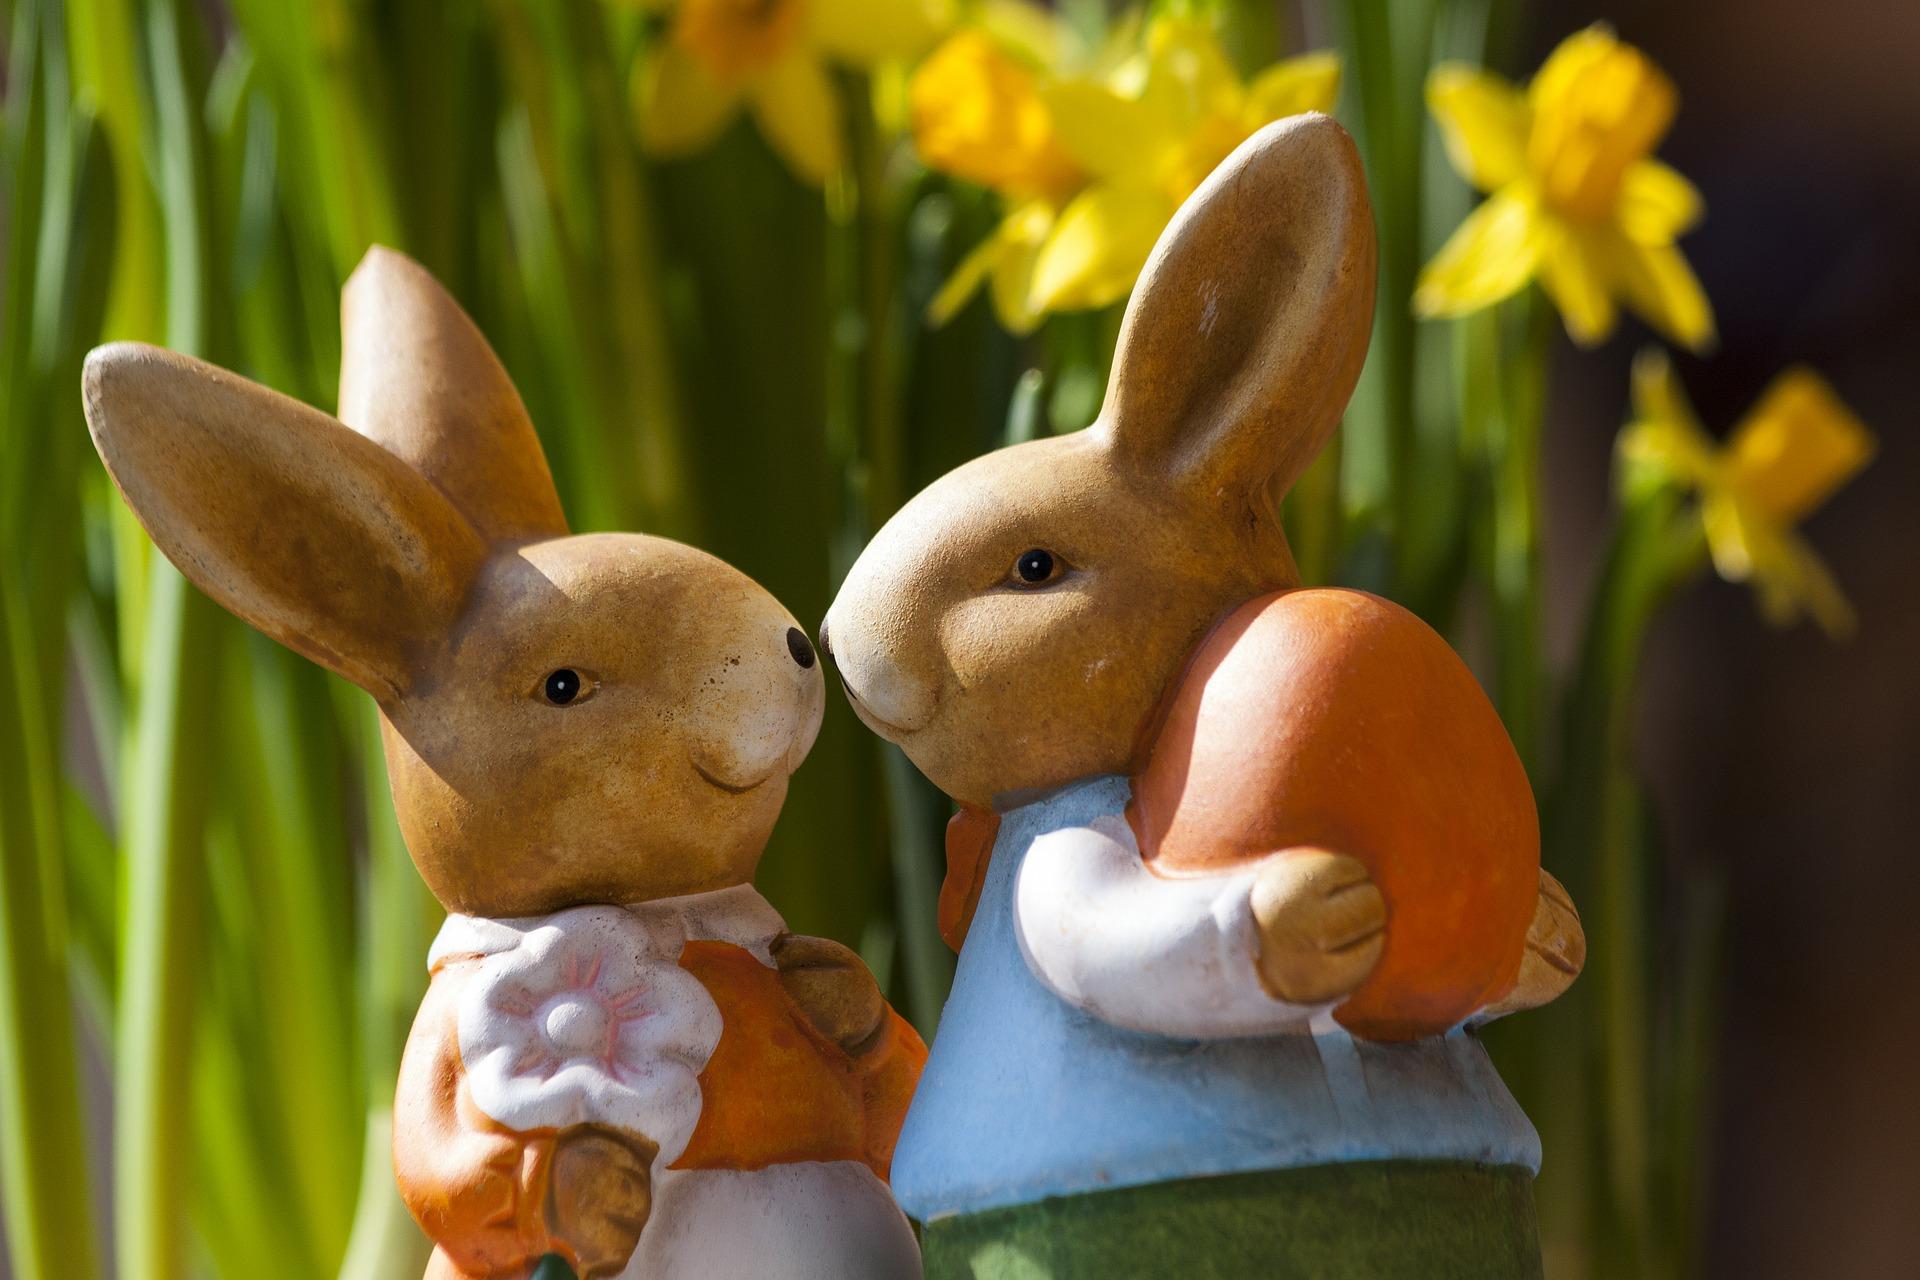 Terry calls me Mrs Honey Bunny… and I call him Mr Honey Bunny.